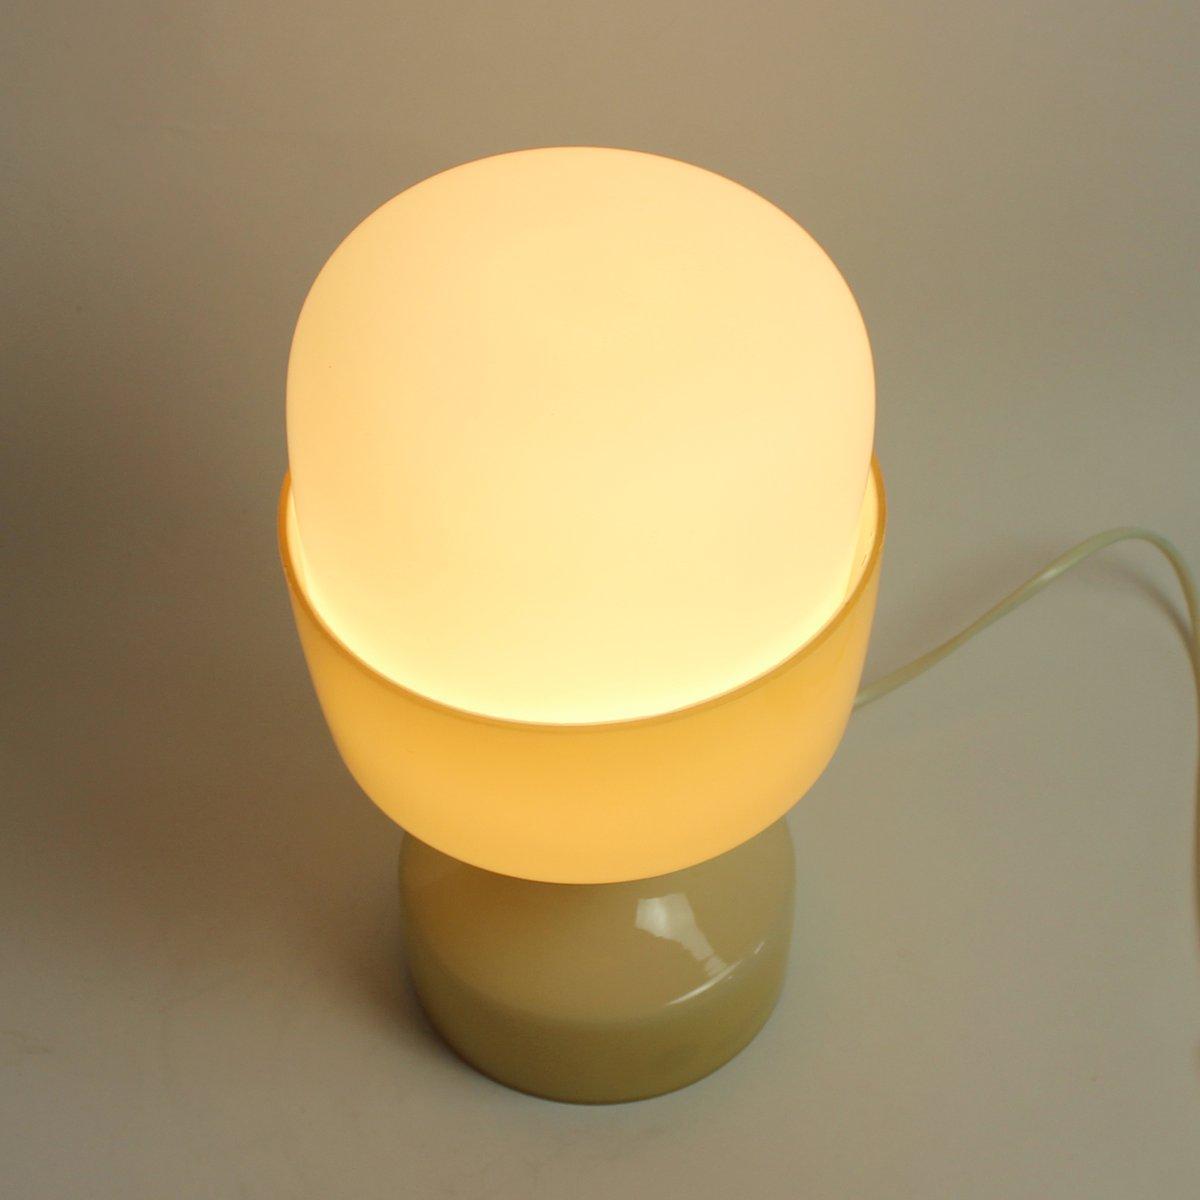 vintage cremefarbene glas lampe von ivan jakes f r osv tlovac sklo 1970er bei pamono kaufen. Black Bedroom Furniture Sets. Home Design Ideas